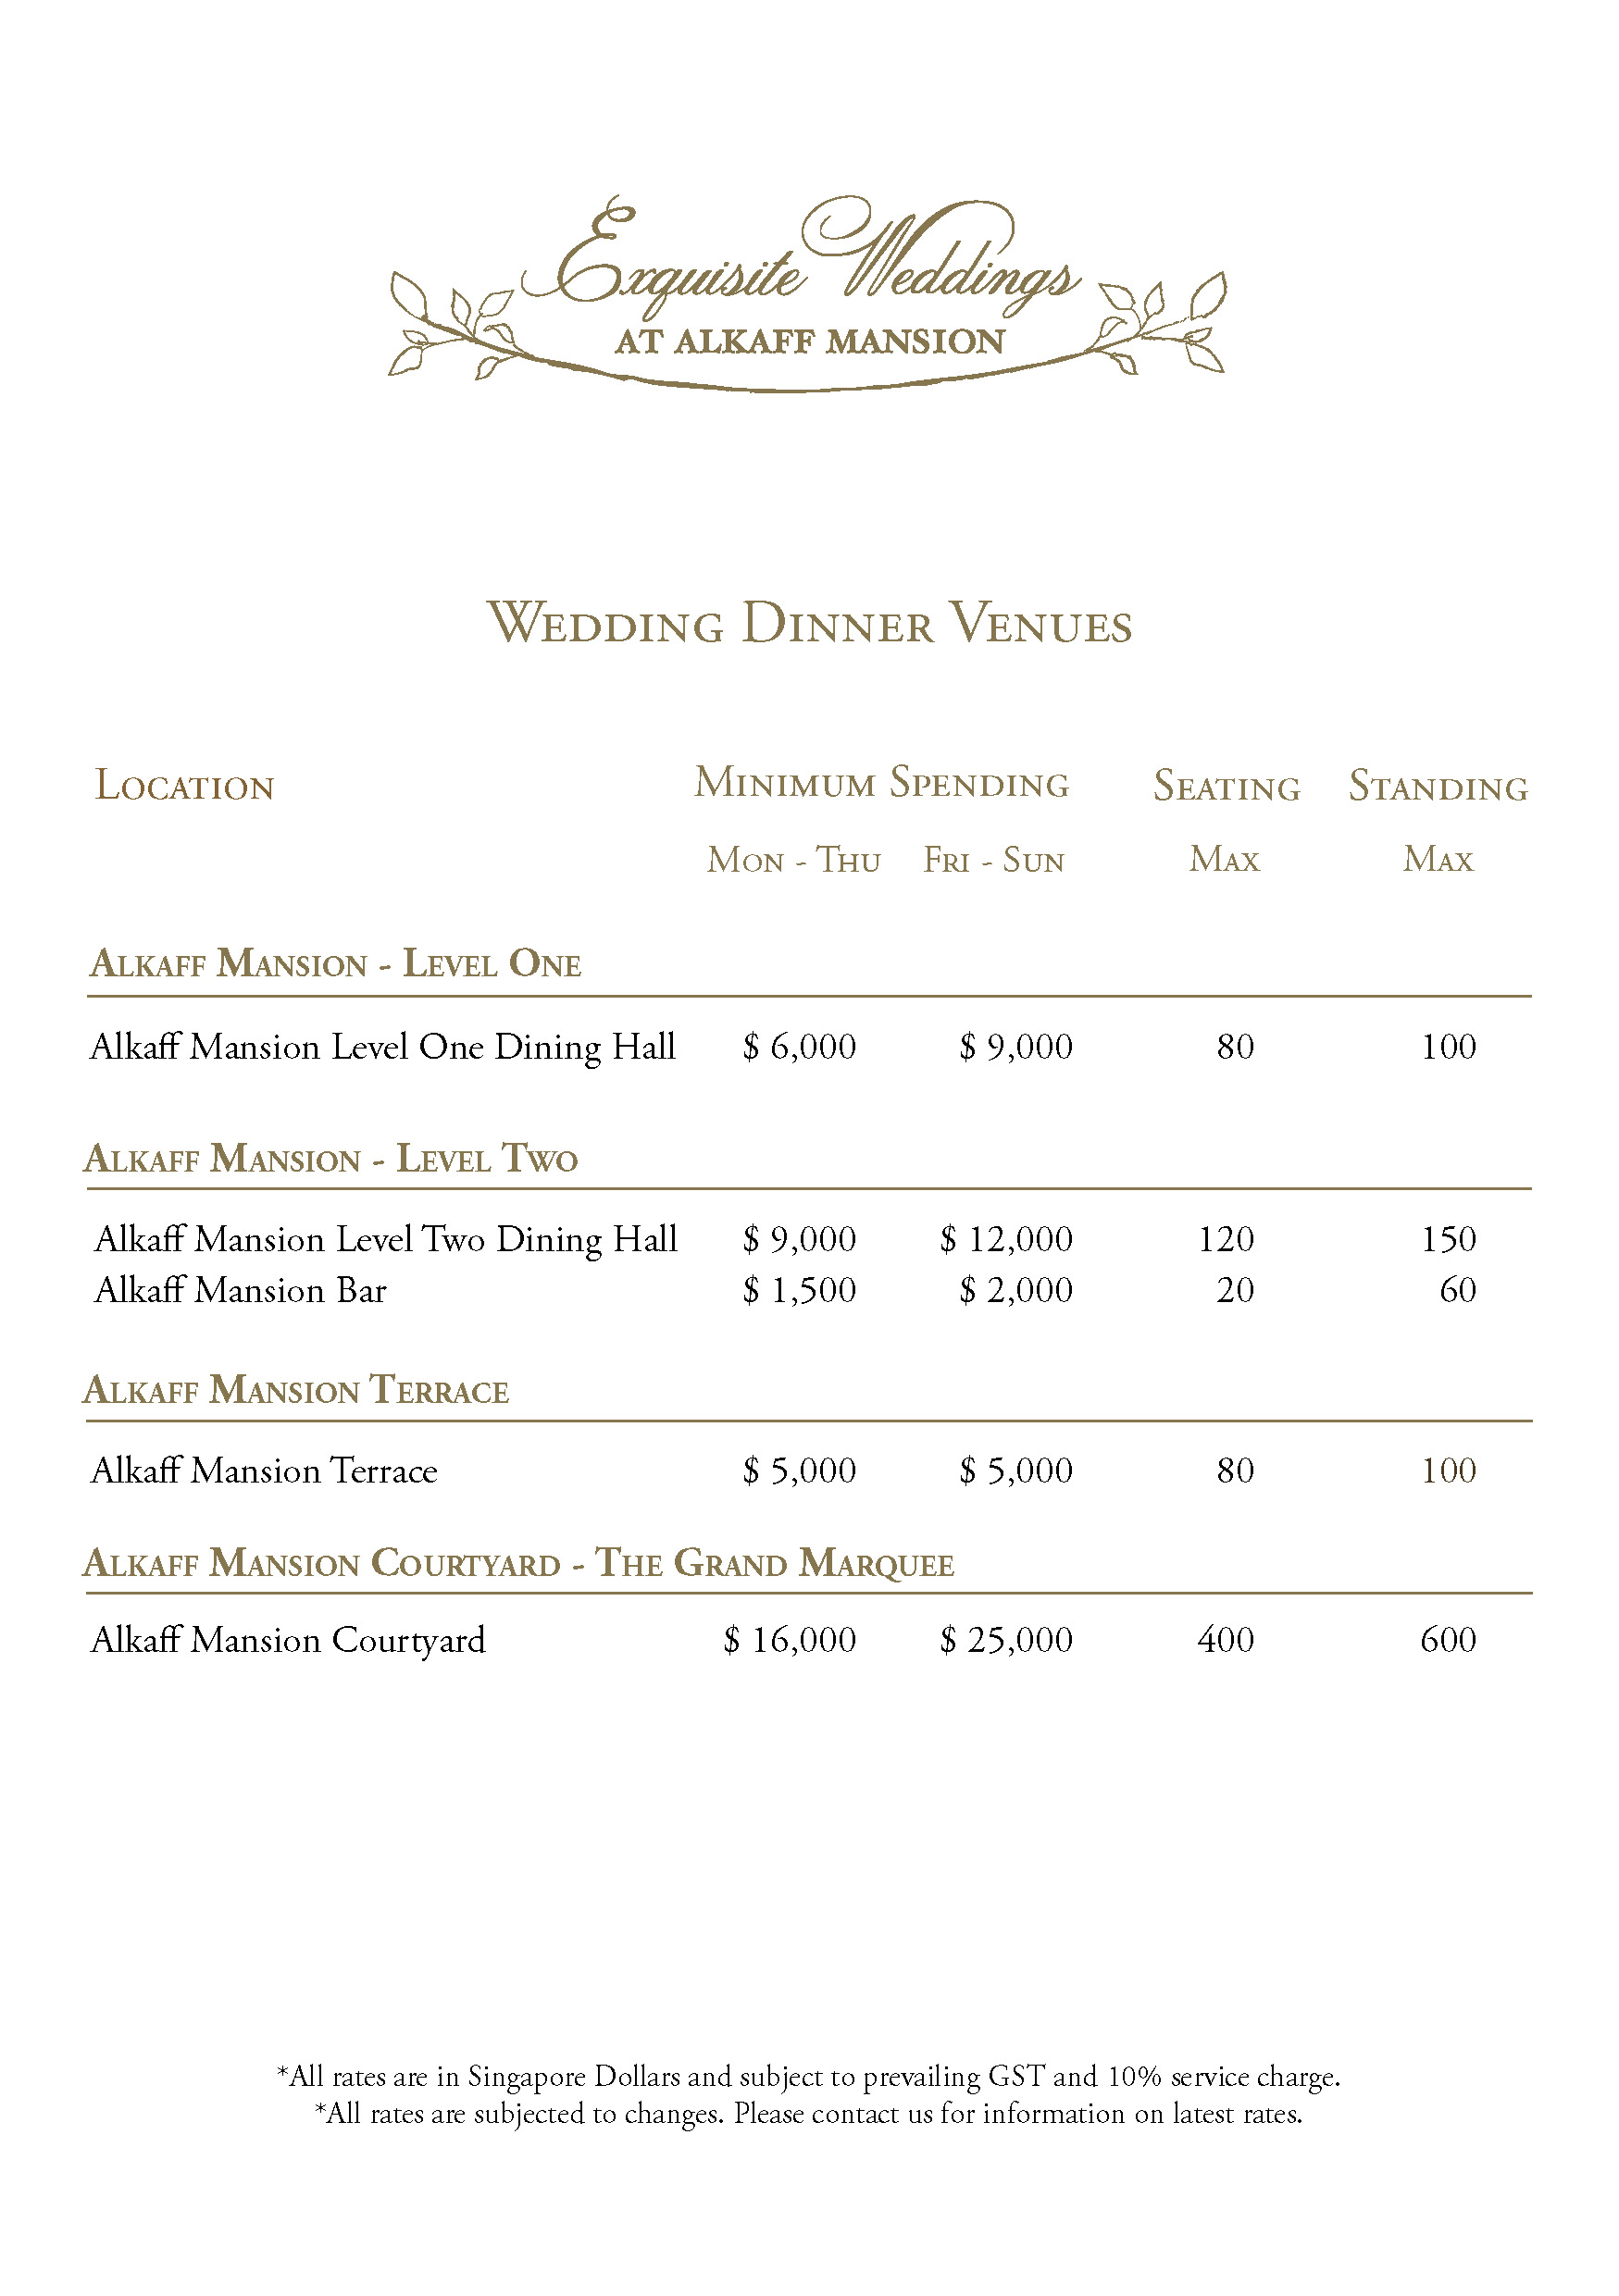 Alkaff Mansion Ristorante Wedding Venue